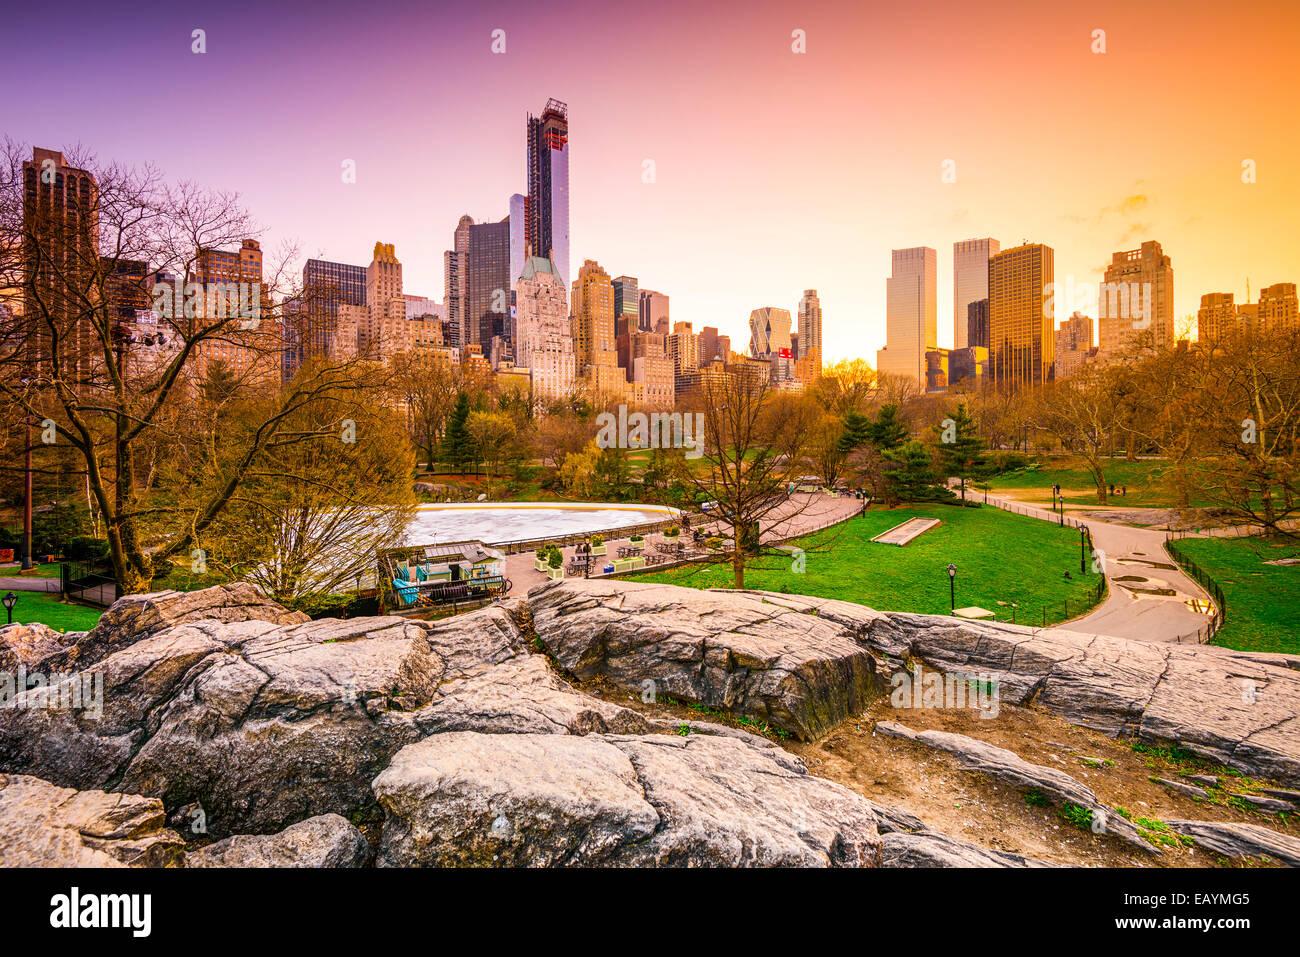 New York City Stadtbild Ansicht vom Central Park entfernt. Stockbild